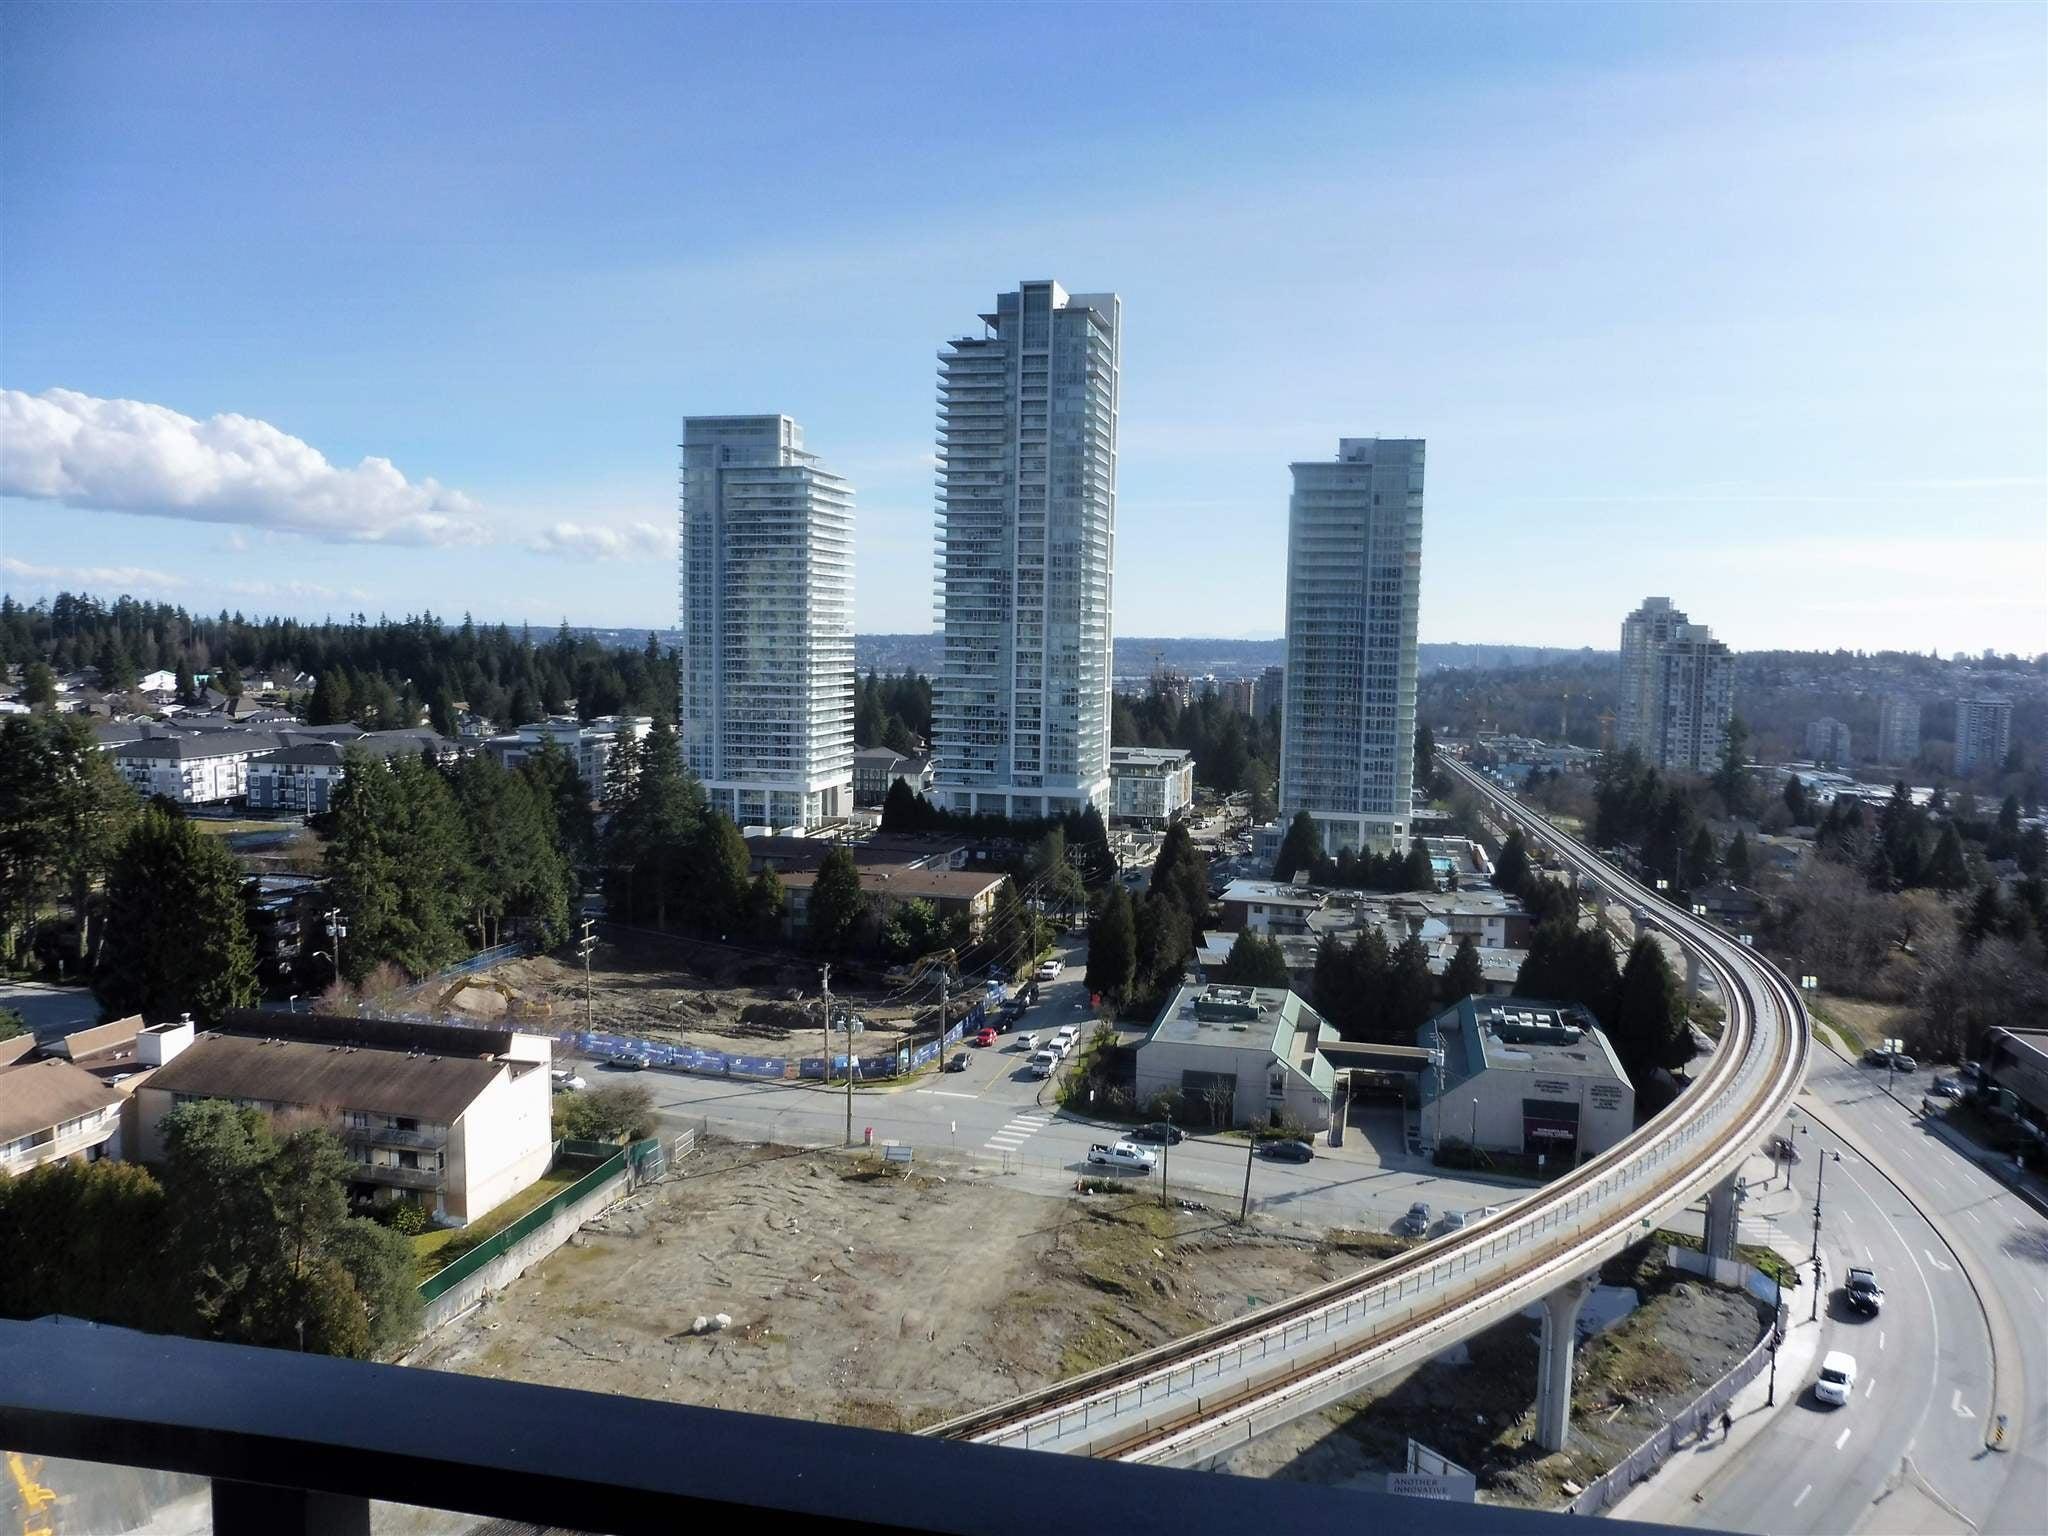 1409 691 NORTH ROAD - Coquitlam West Apartment/Condo for sale, 2 Bedrooms (R2604155) - #1